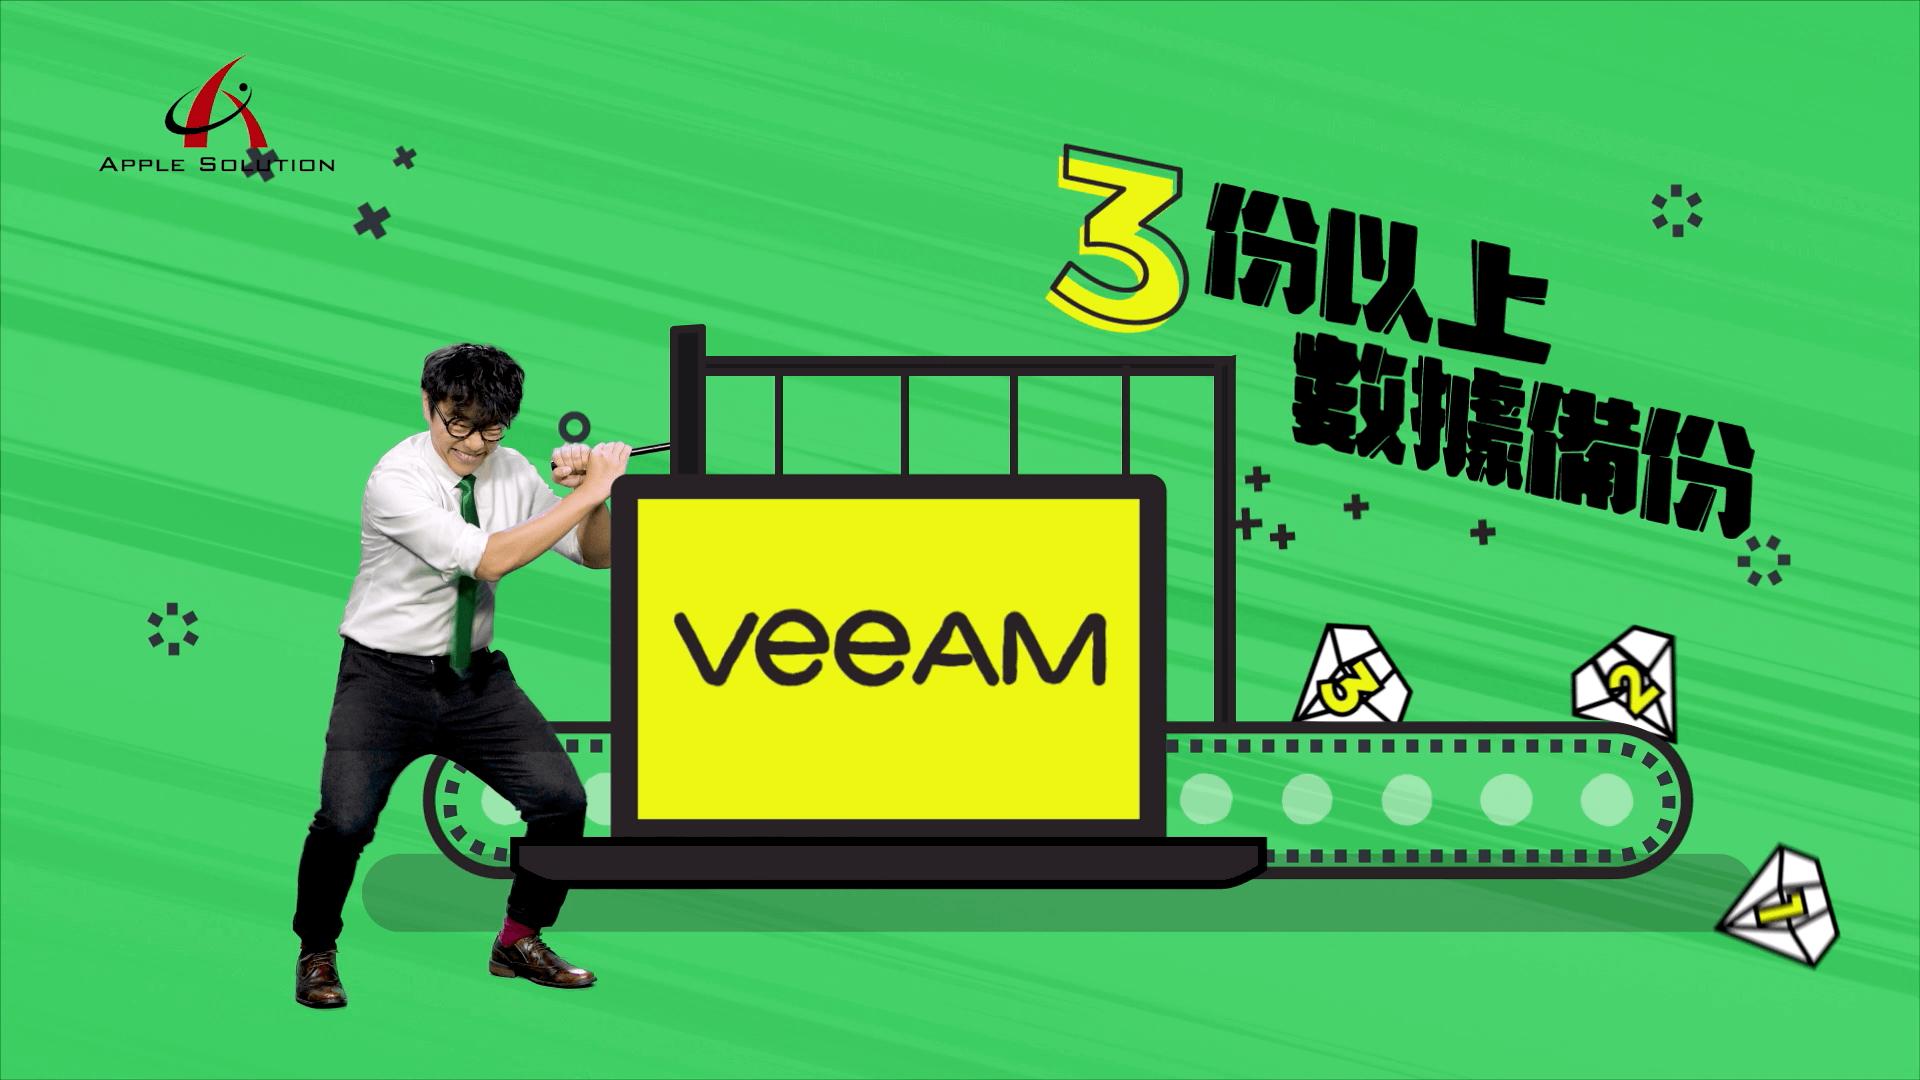 Apple Solution x Veeam